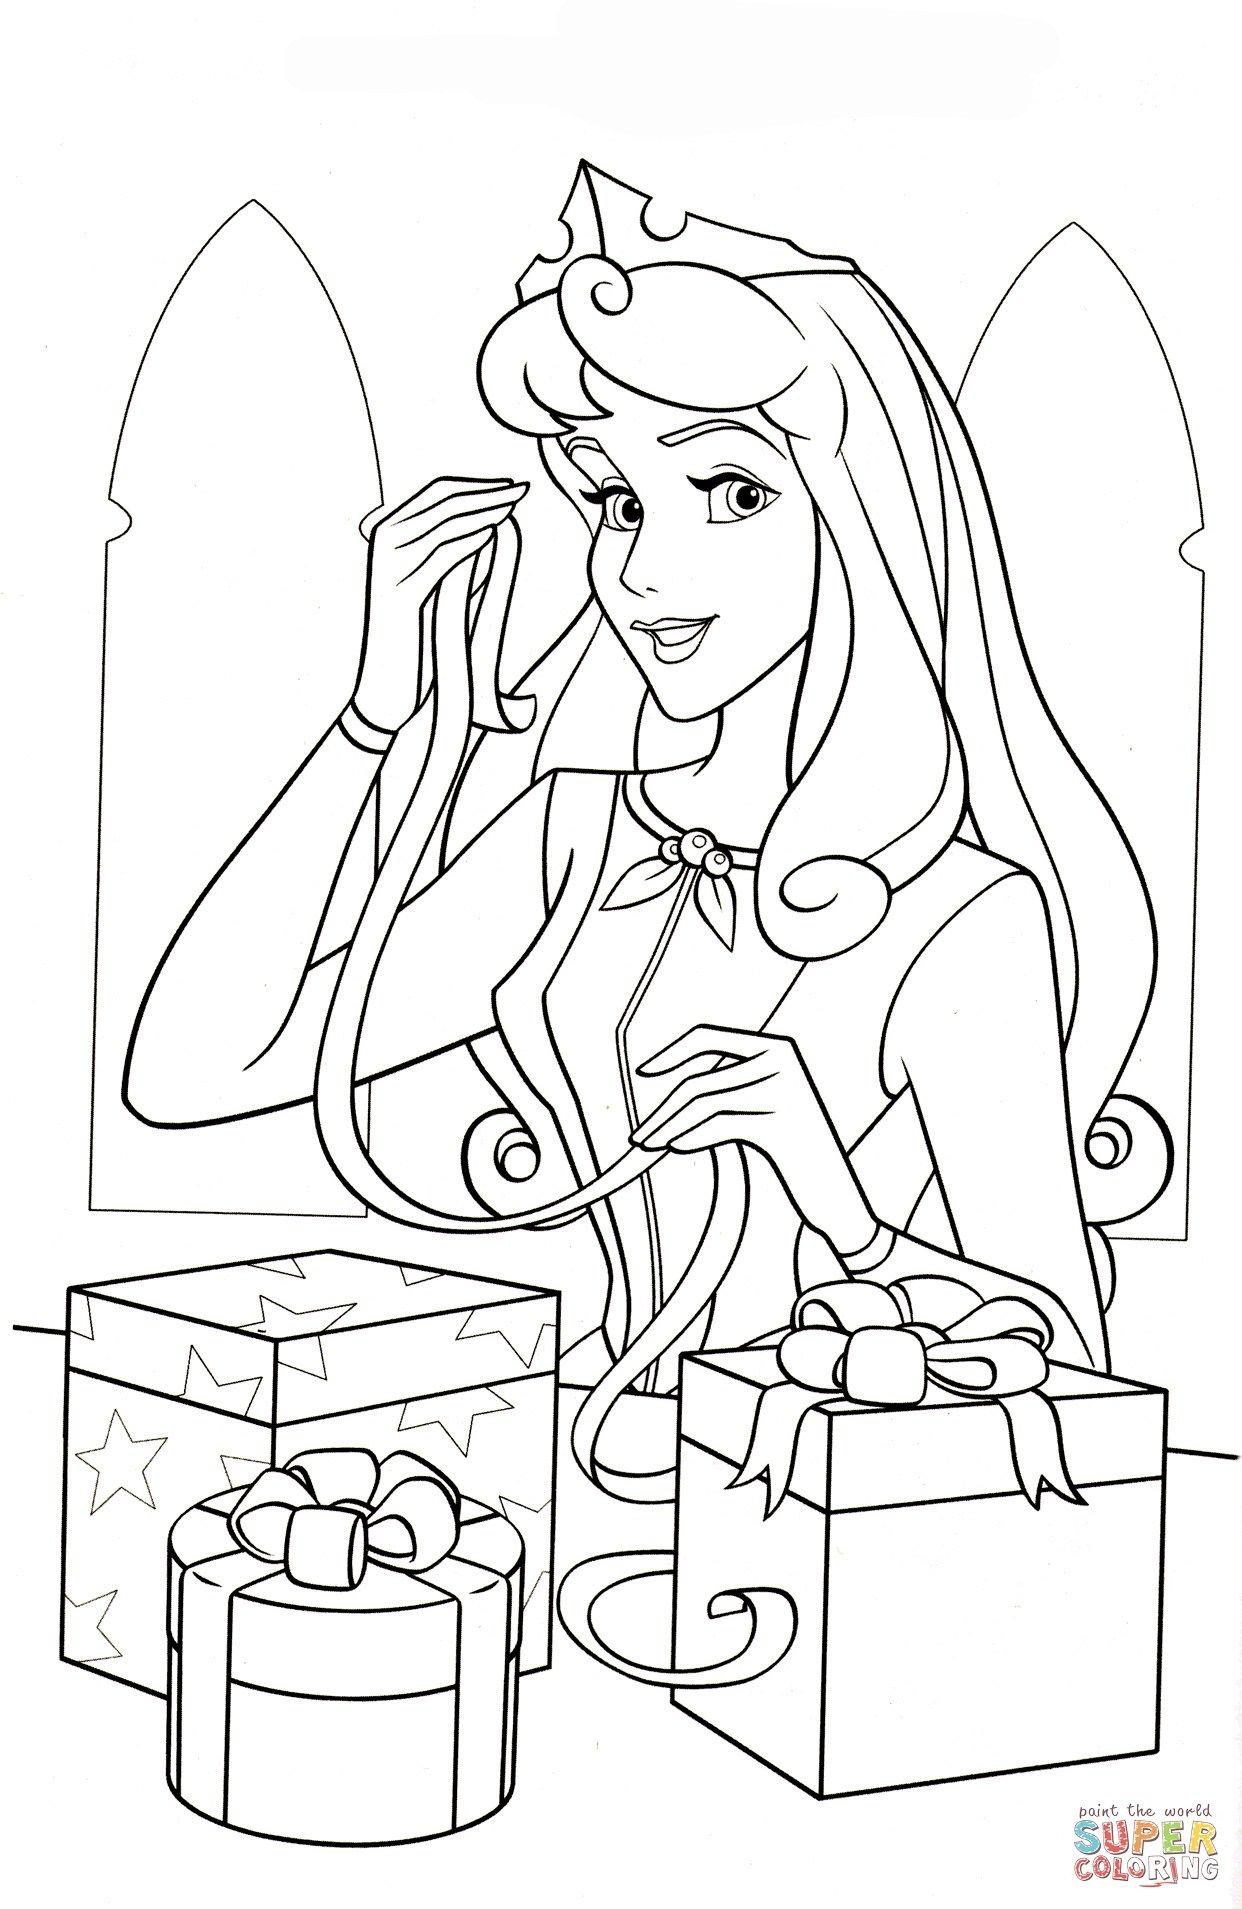 24 Amazing Image Of Aurora Coloring Pages Davemelillo Com Disney Princess Coloring Pages Princess Coloring Pages Christmas Coloring Pages